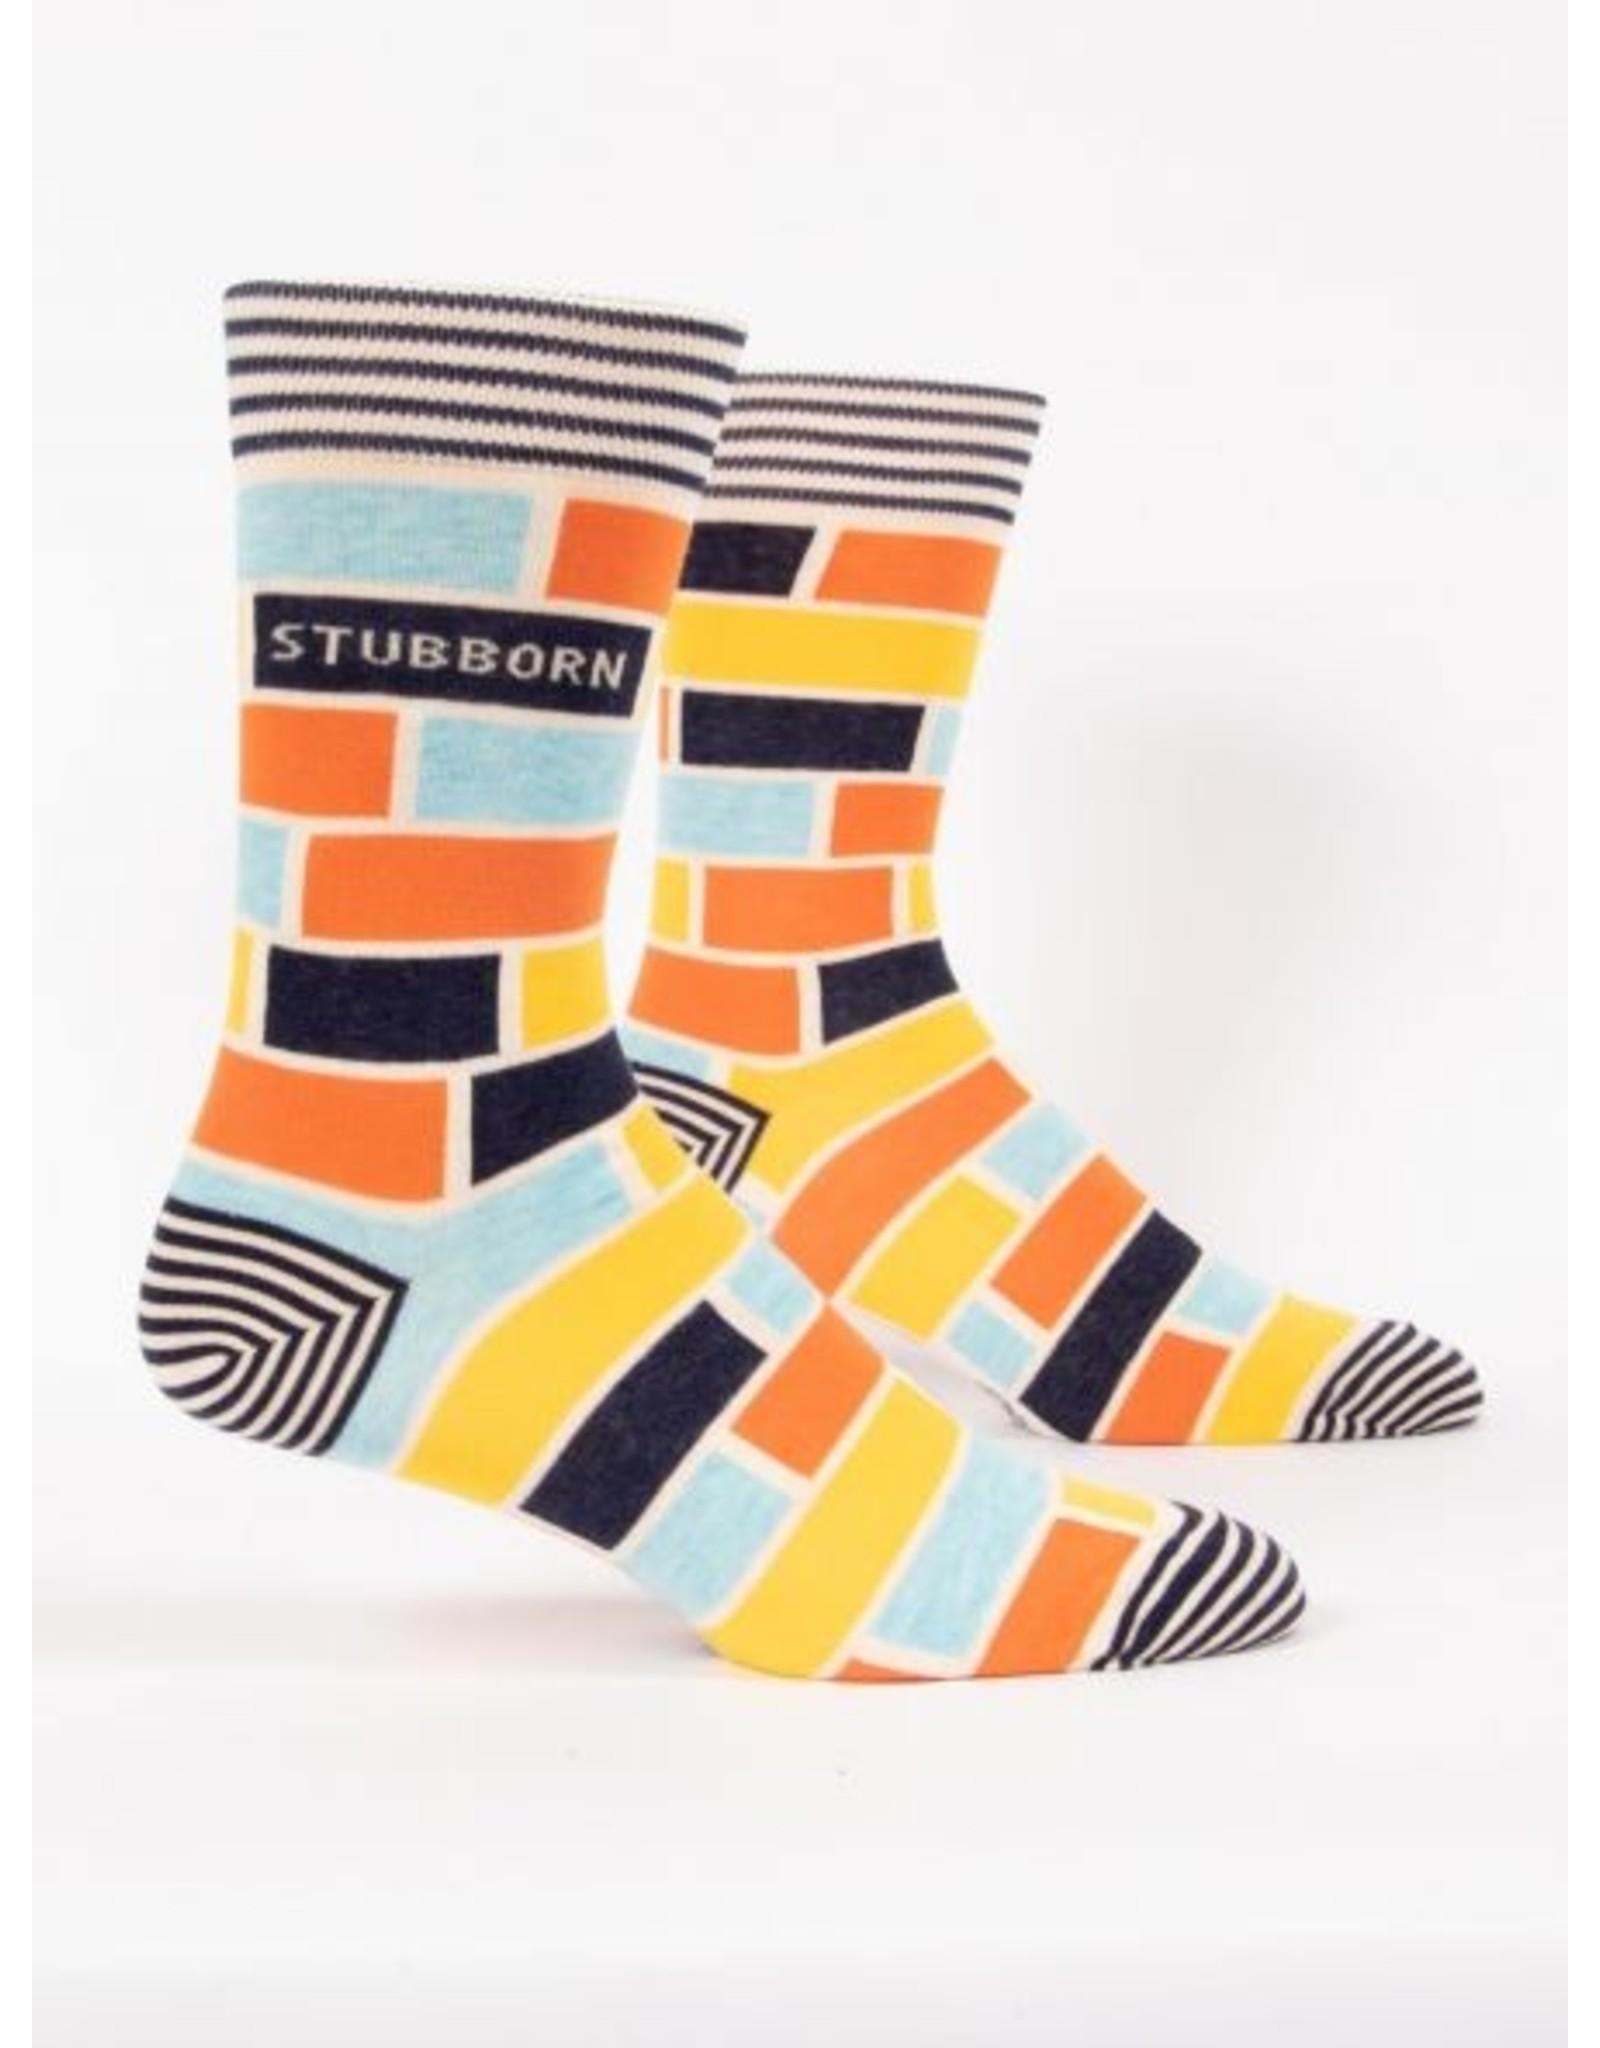 BQ Mens Sassy Socks - Stubborn